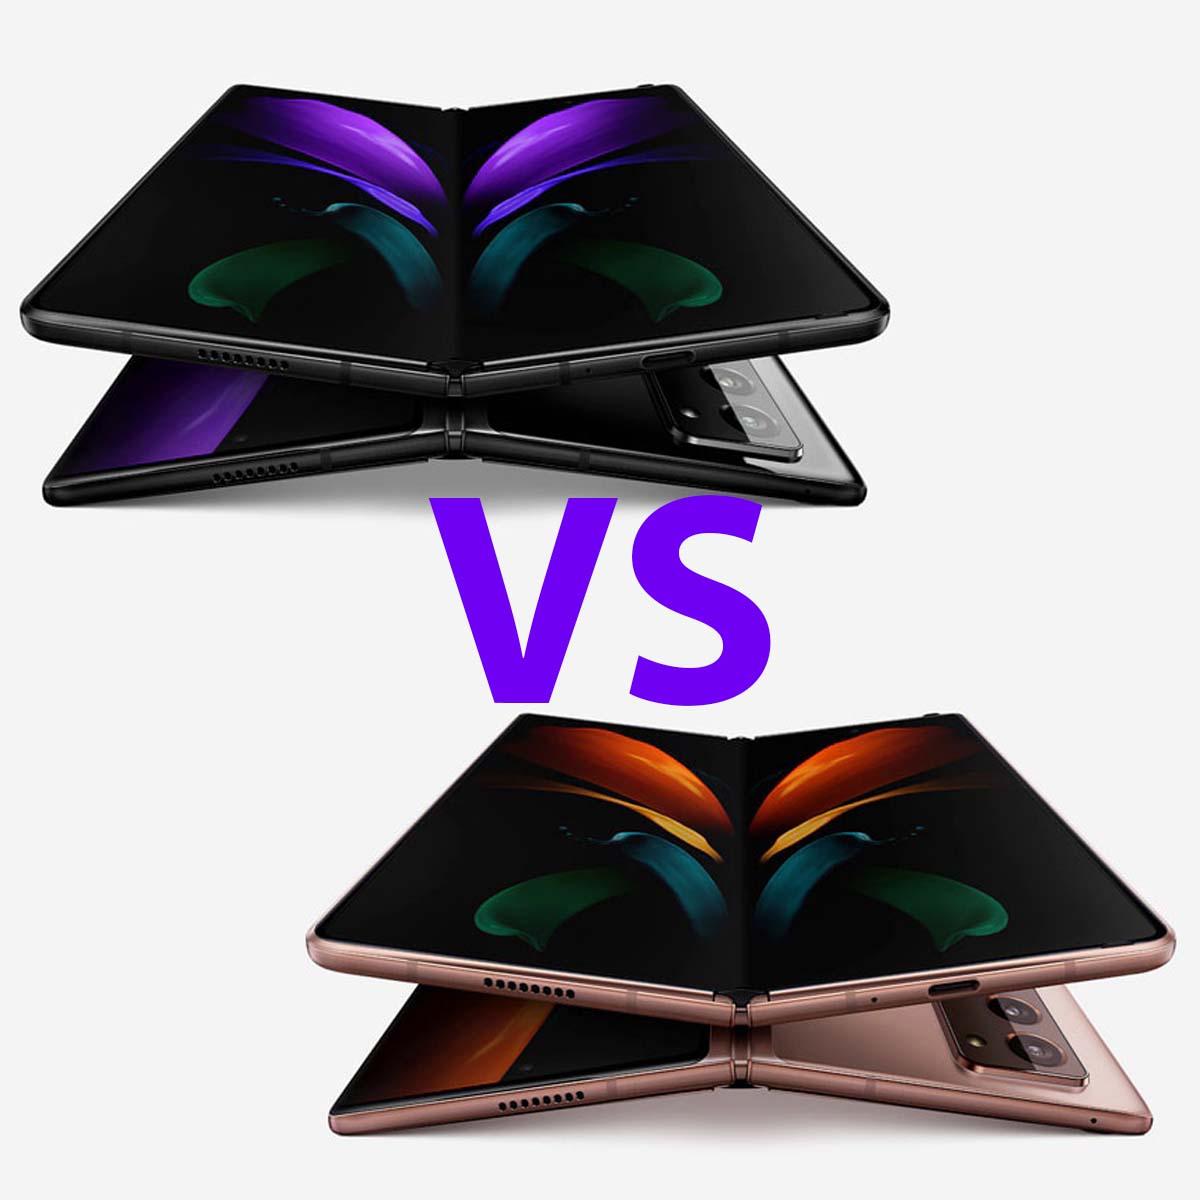 Samsung Galaxy Z Fold 3 vs Galaxy Z Fold 2 сравнение смартфонов